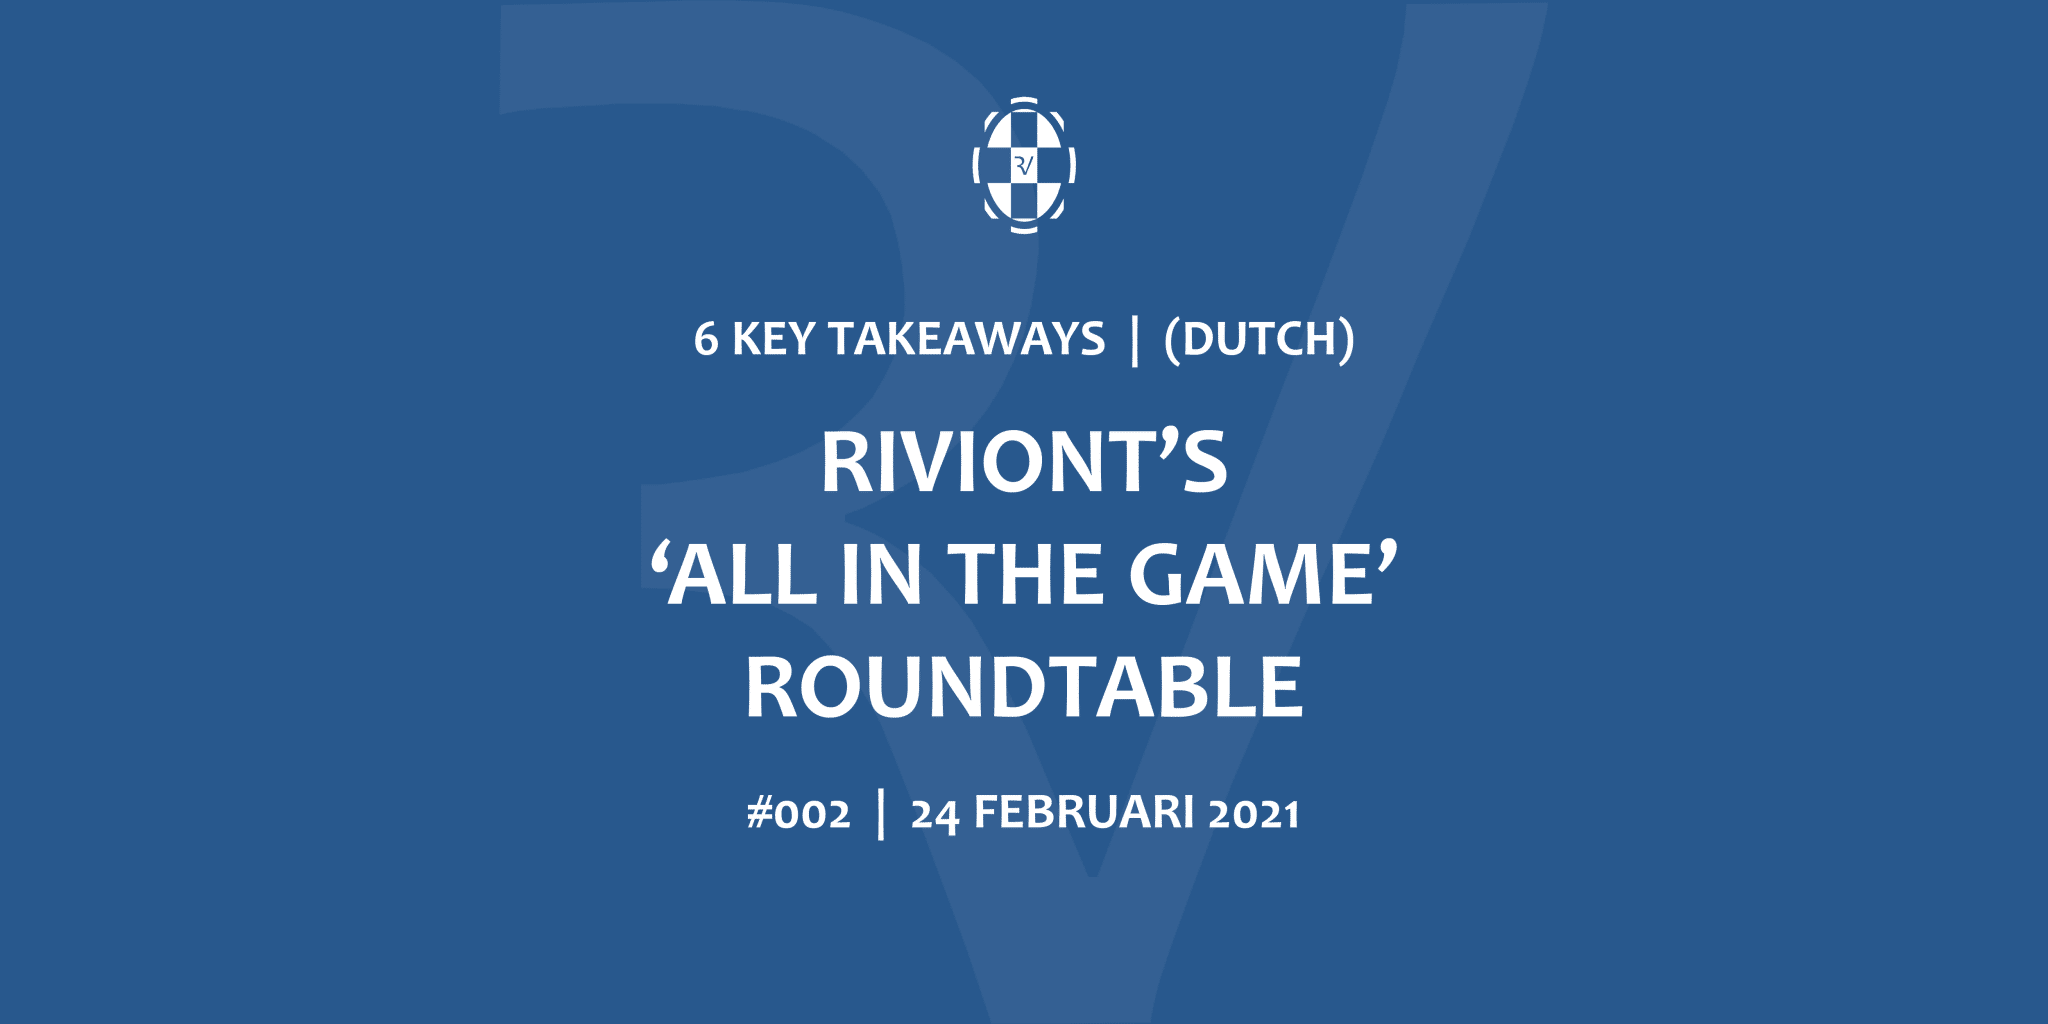 6 KEY TAKEAWAYS 'ALL IN THE GAME' ROUNDTABLE 24 FEBRUARI 2021